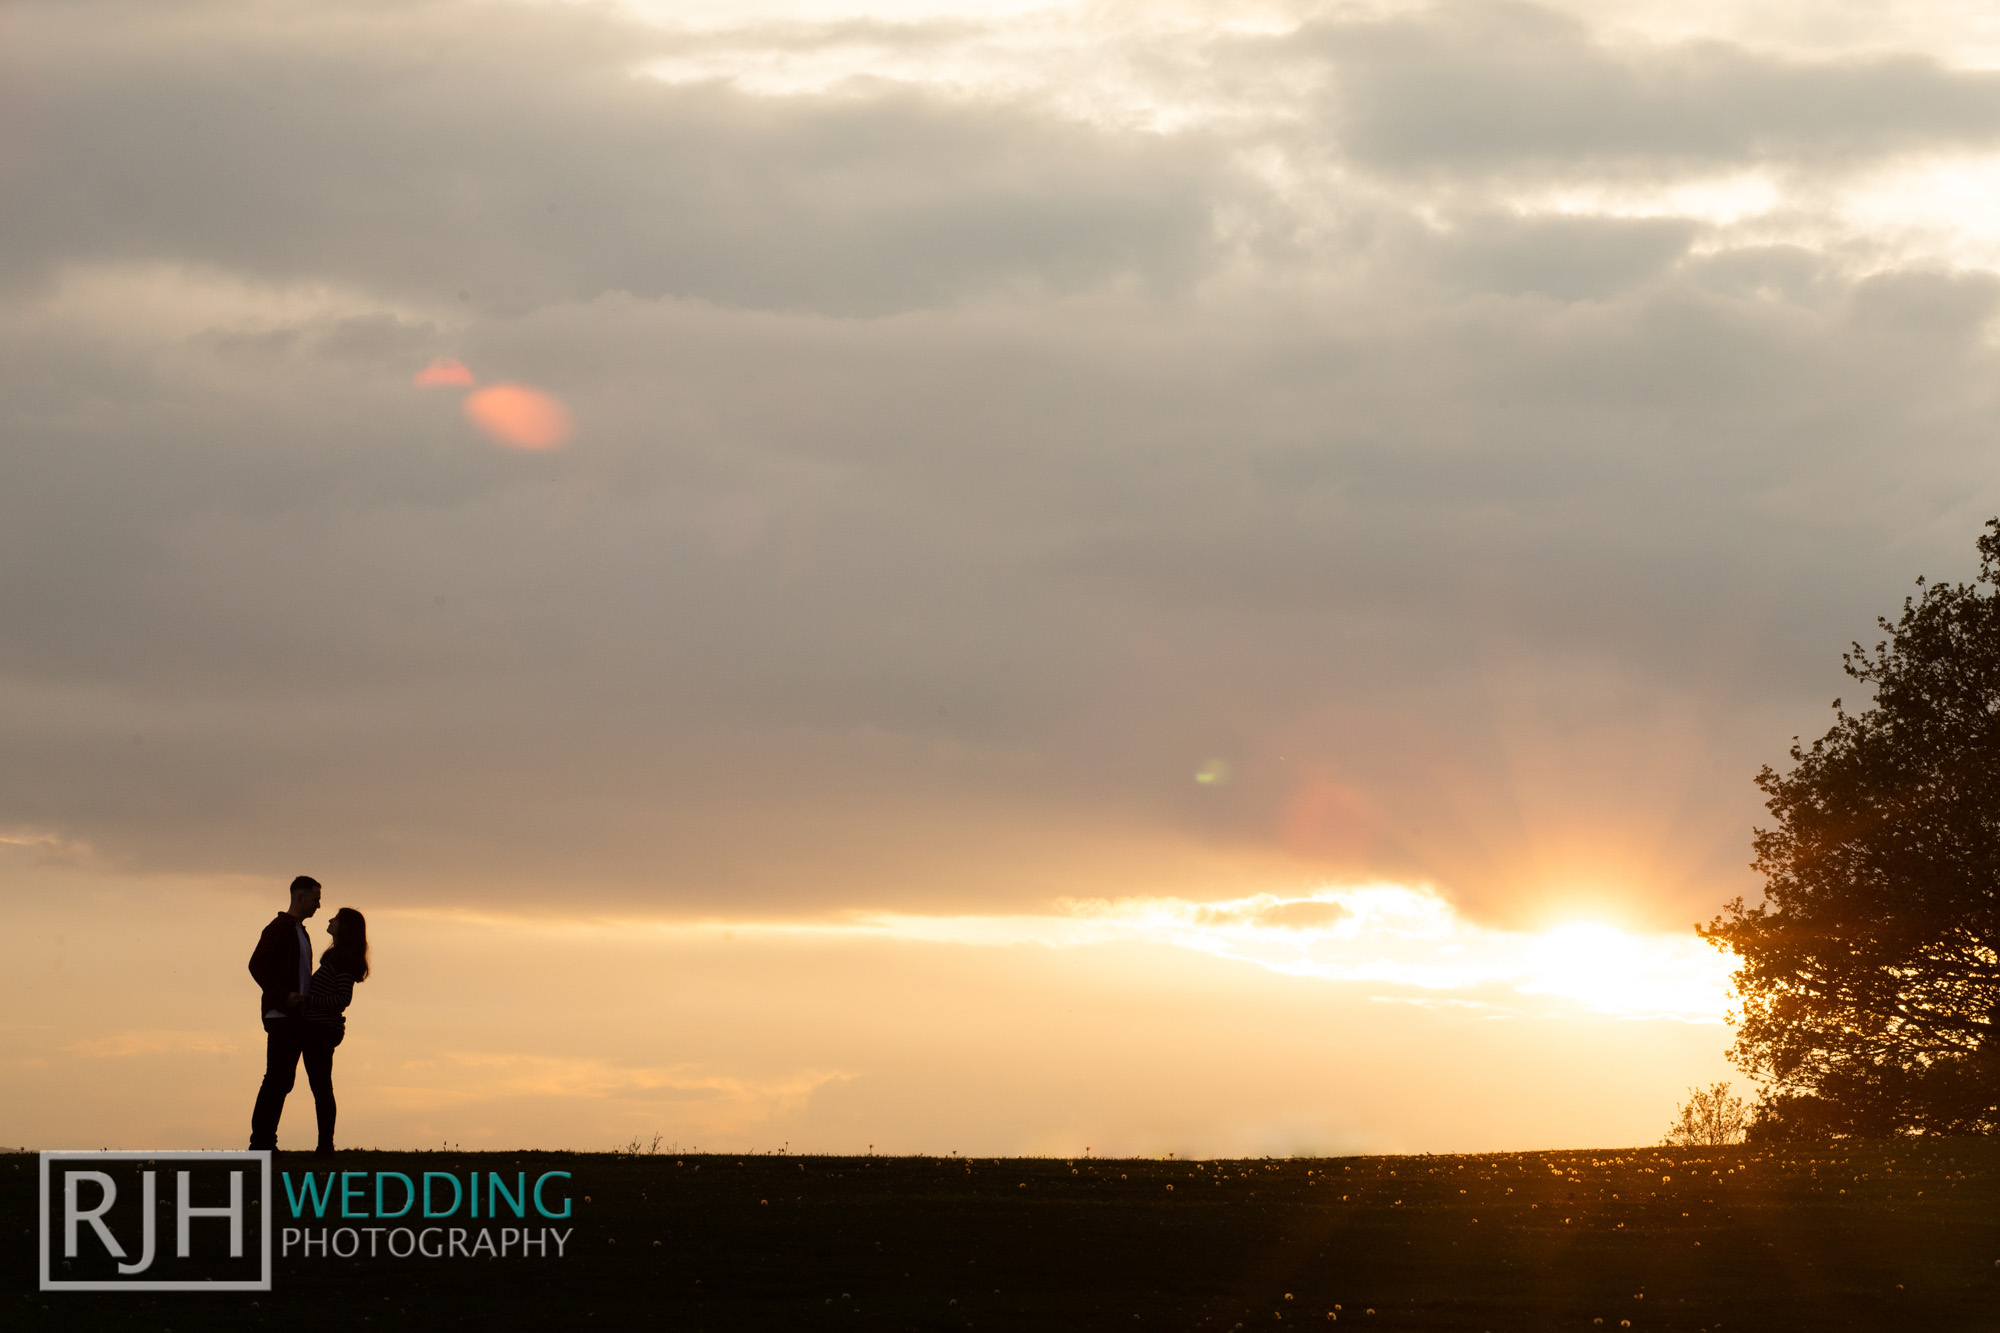 Pre-wedding photography_Abbie & Reece_Graves Park_030_IMG_1242-1.jpg